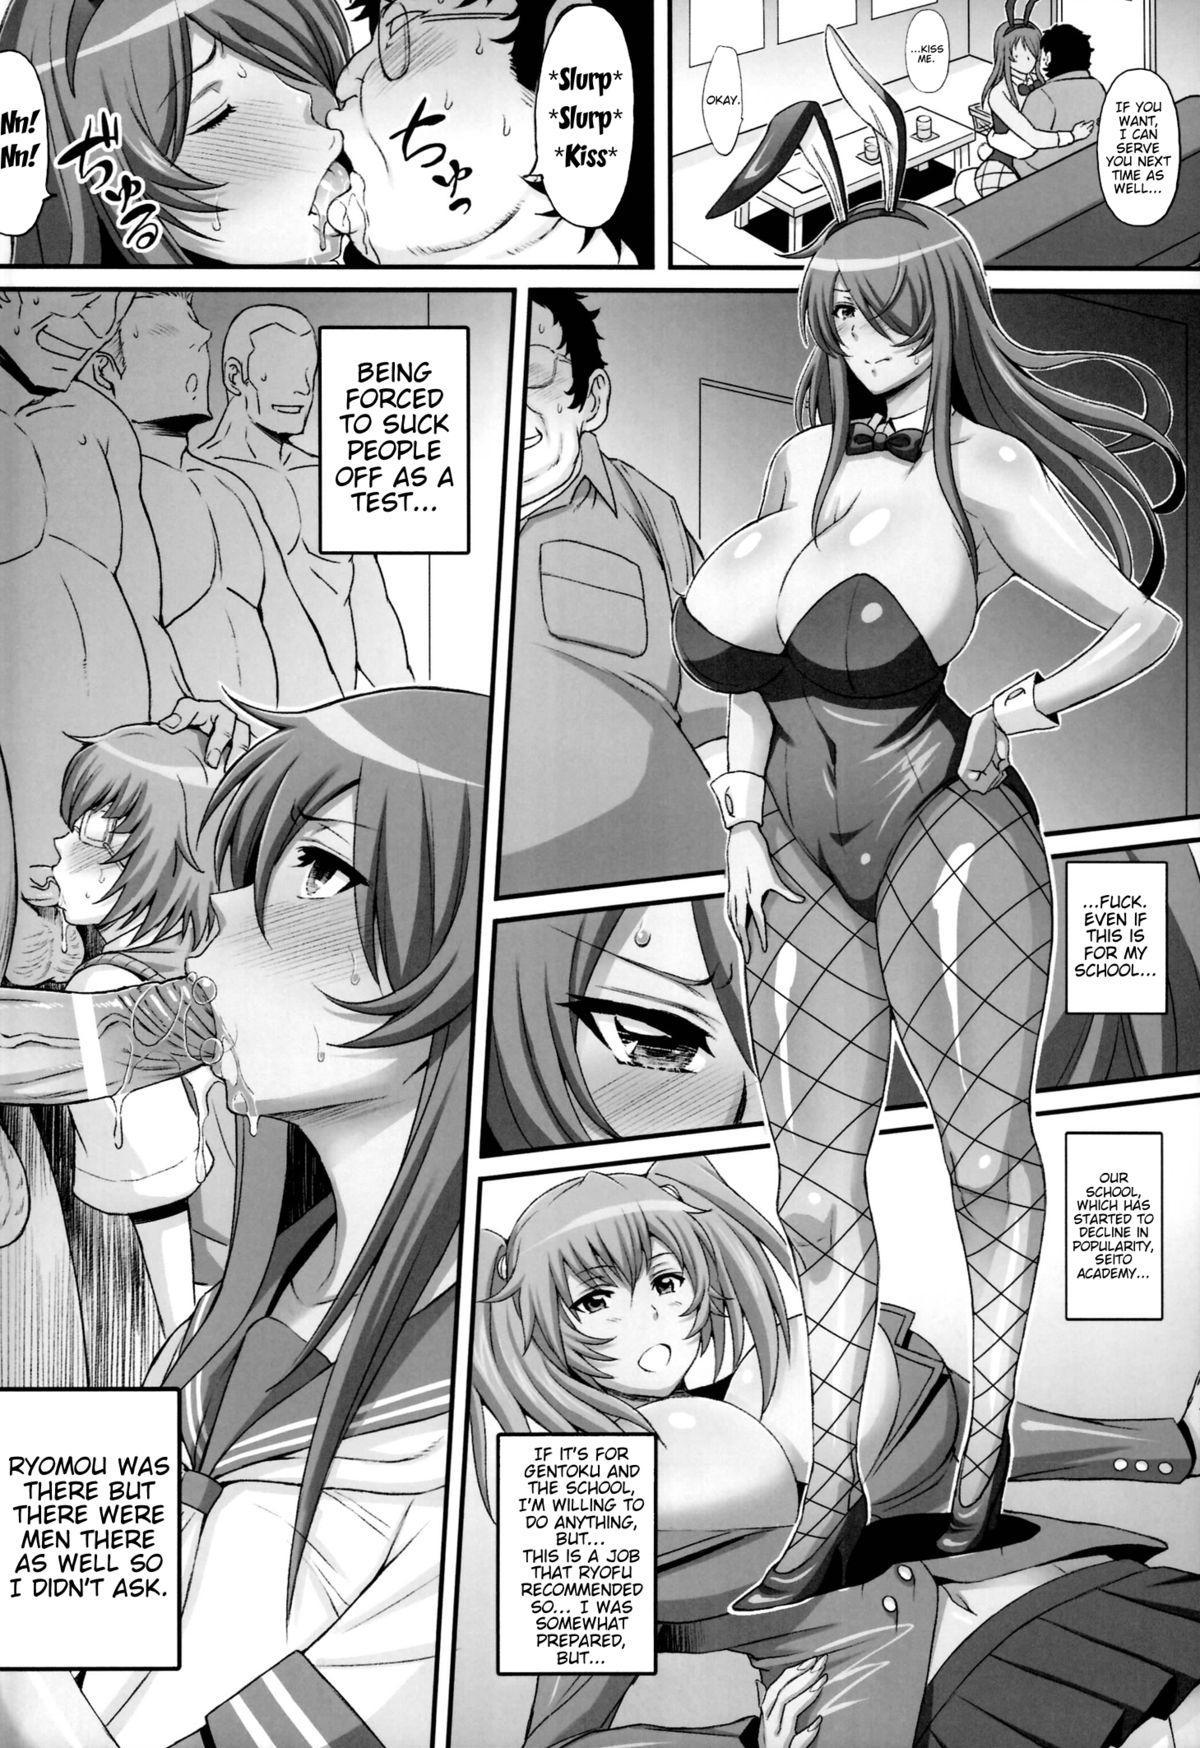 (C86) [Diogenes Club (Haikawa Hemlen)] Shokukan Mankan Zenseki Go Touki Ryoujoku   Shokukan Mankan Zenseki 5 - Princess Rape Battle- Cosplay Kanu (Ikkitousen) [English] {doujin-moe.us} 6